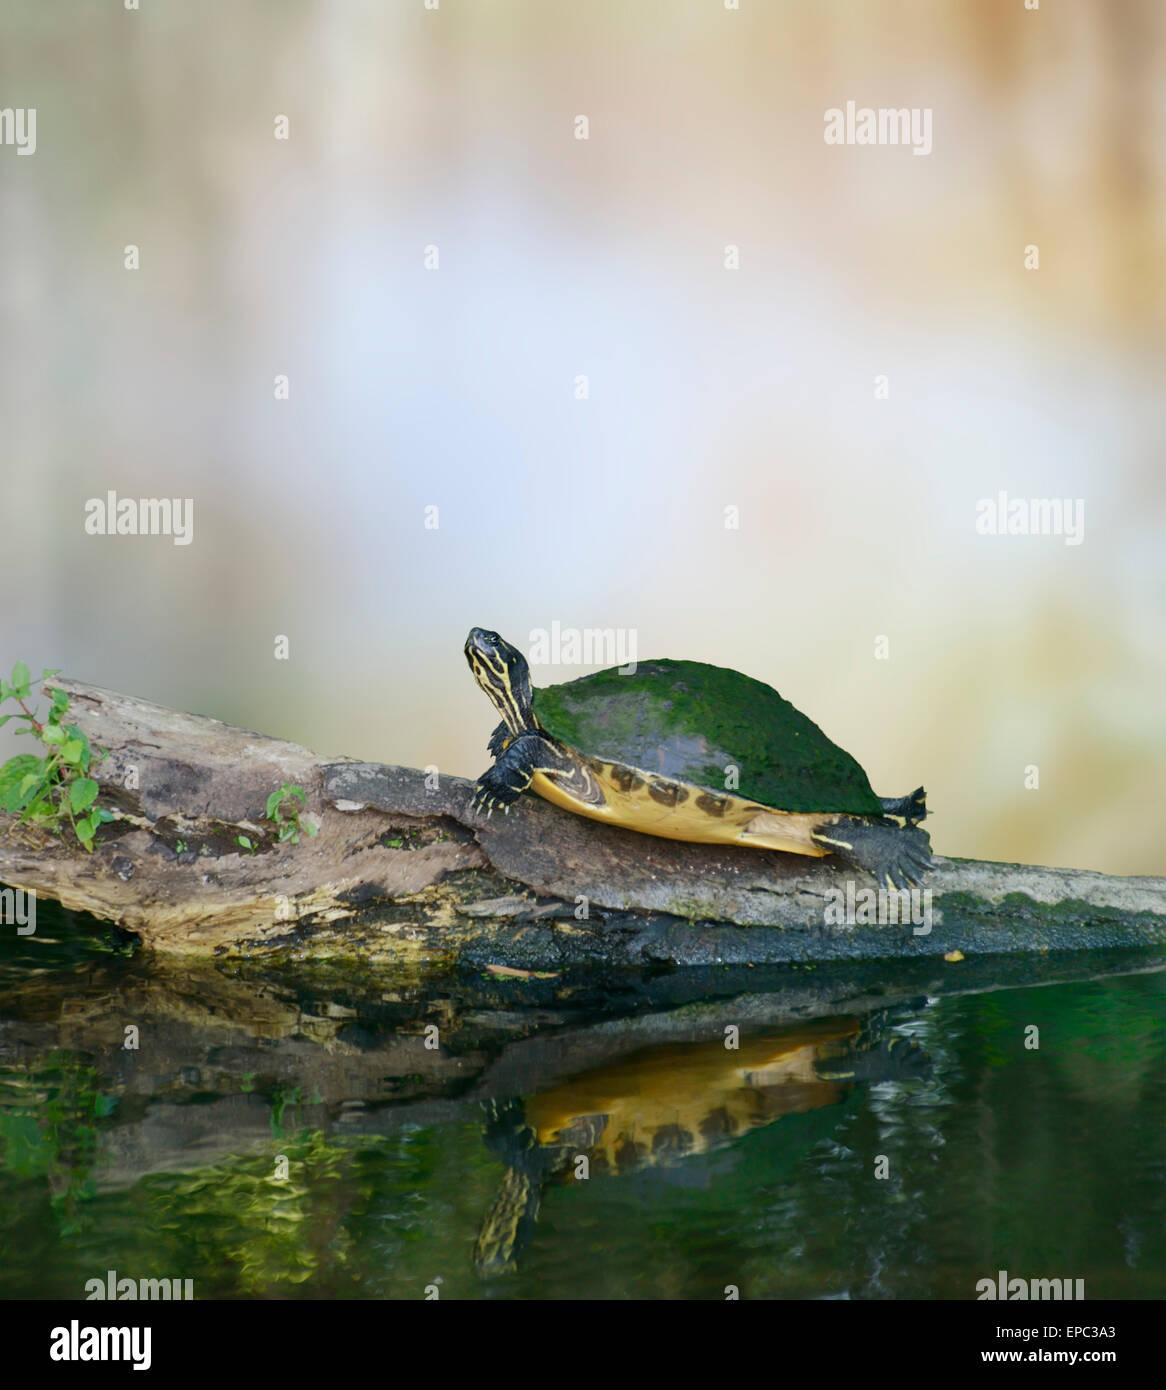 Florida Cooter tortuga en un registro Imagen De Stock